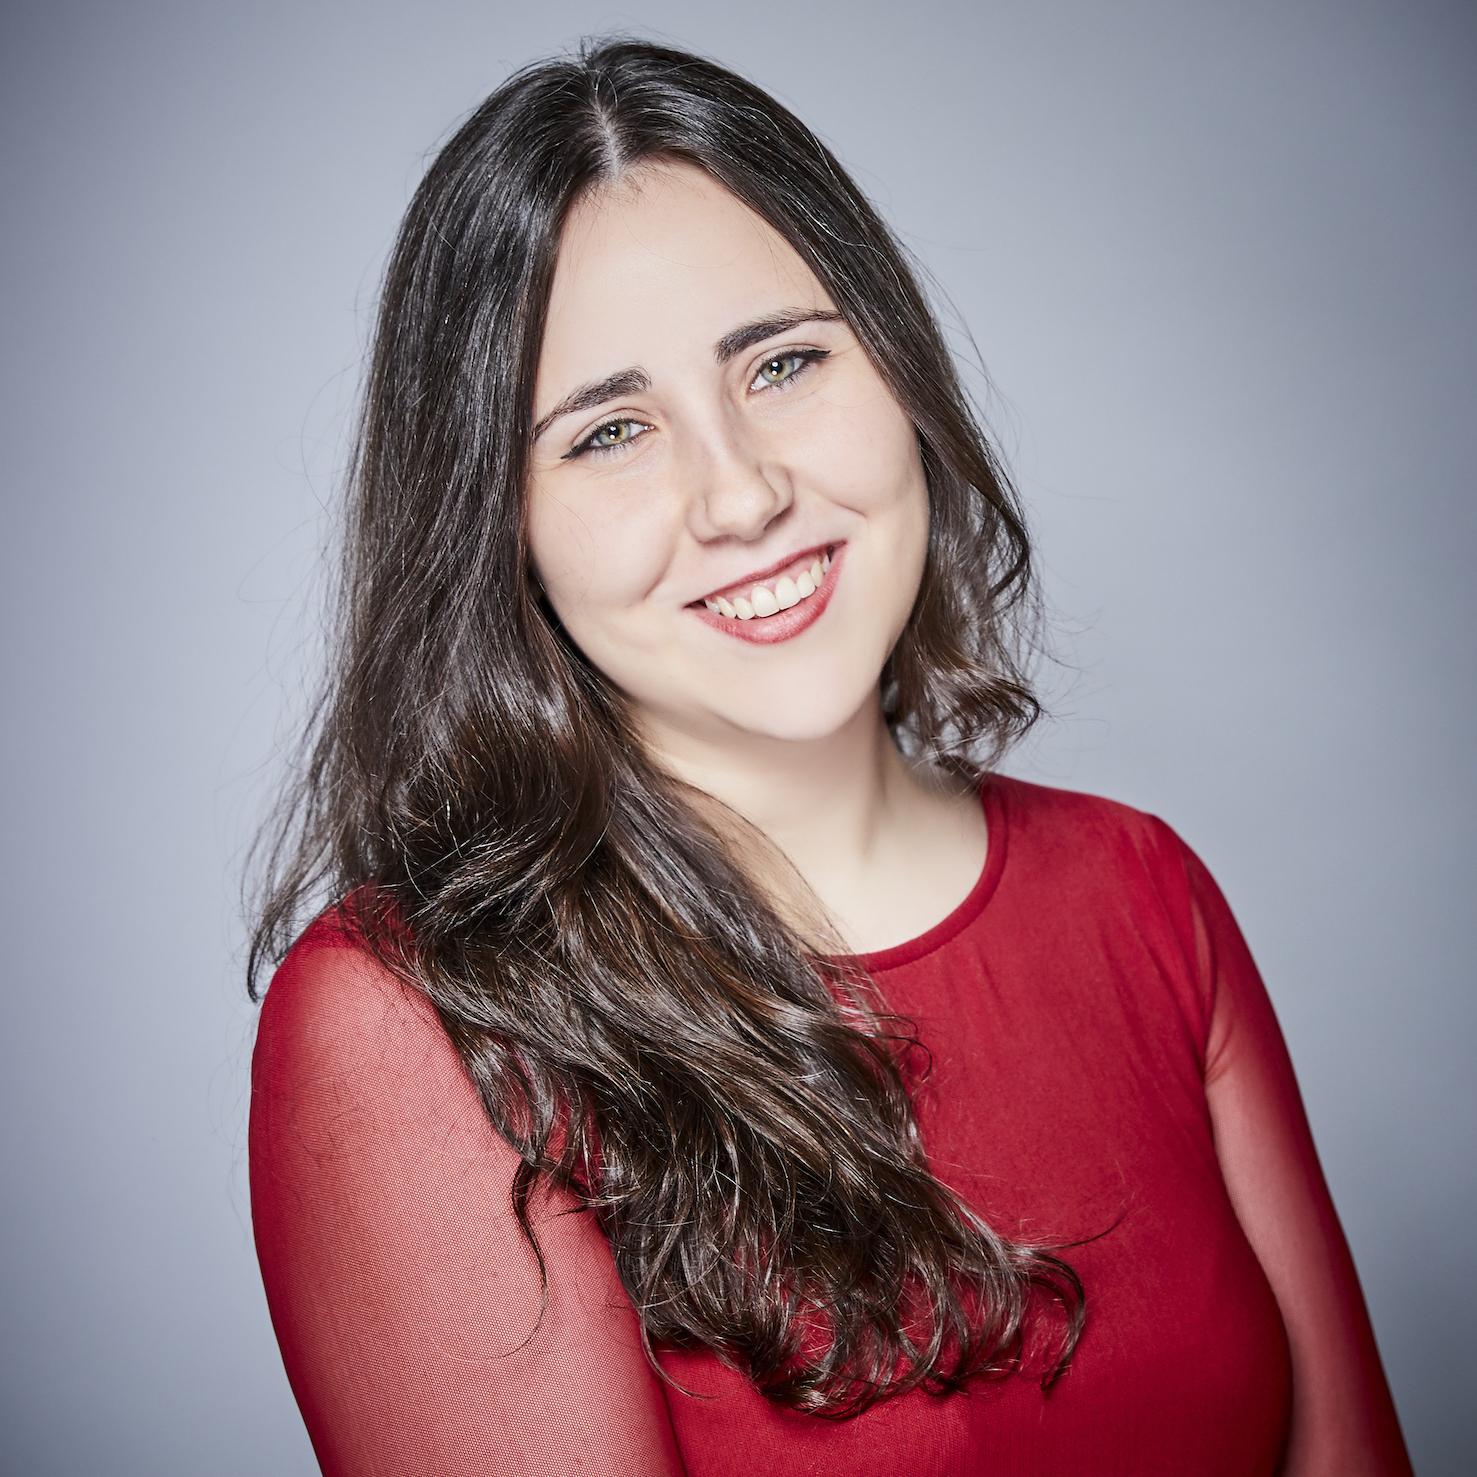 Atenea Miralles